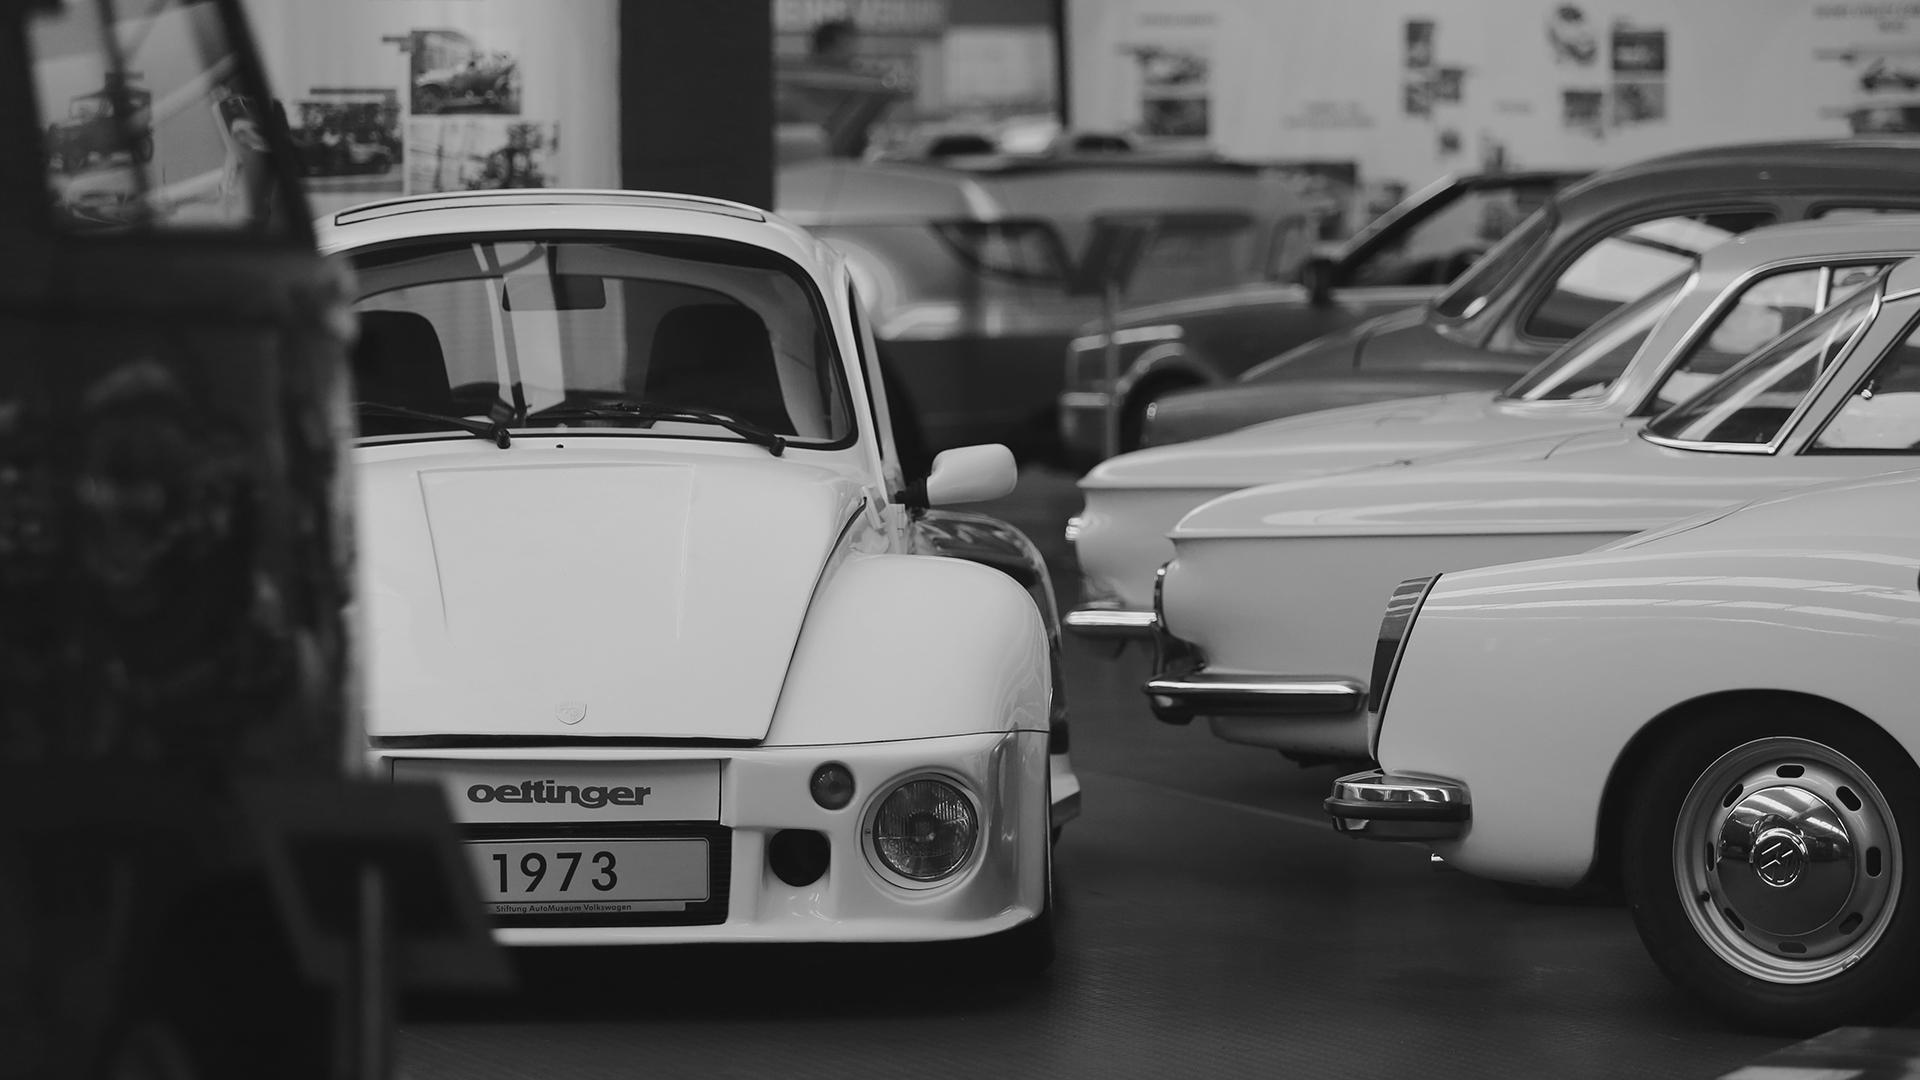 1973 Oettinger Beetle 1303 Wheelsbywovka